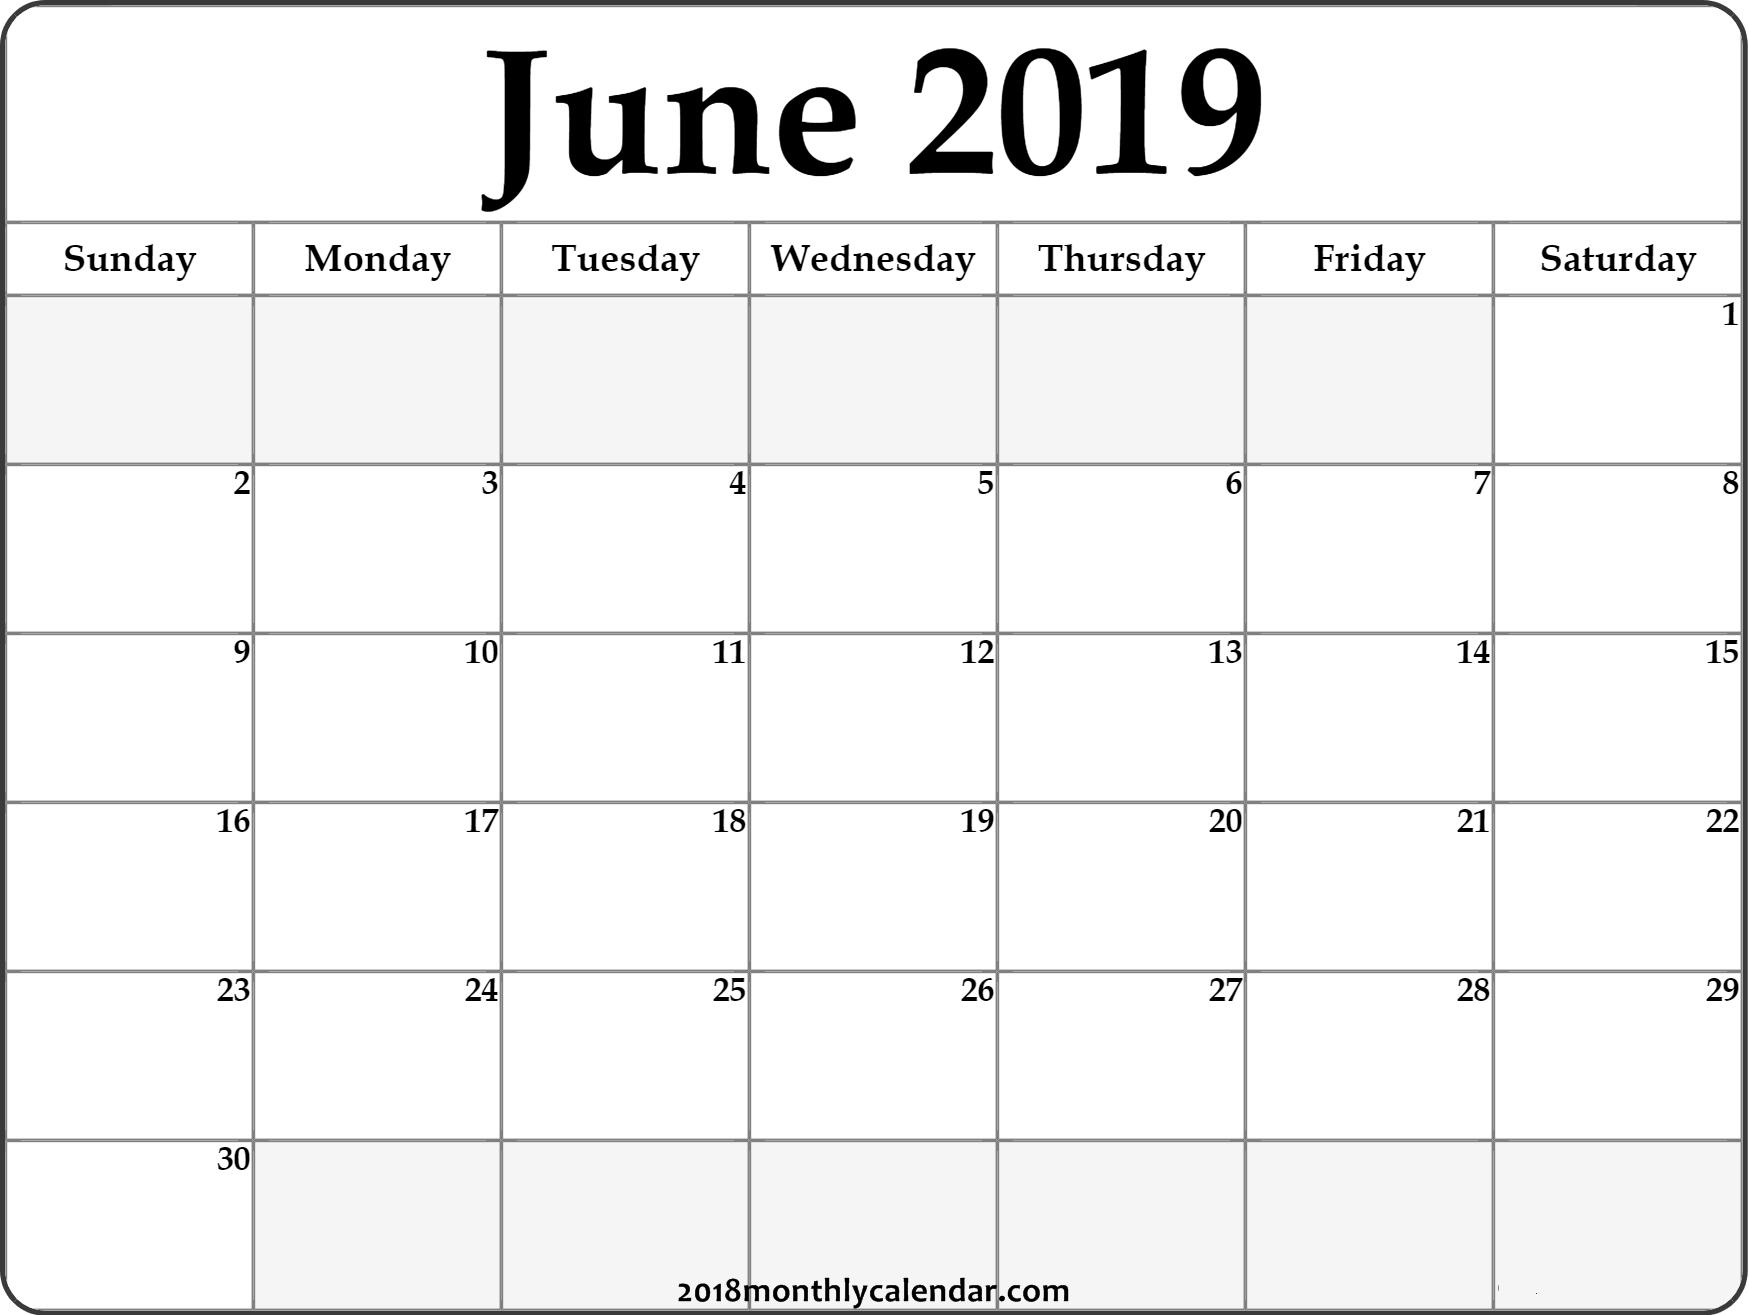 June Calendar 2019 #june #2019Calendar #june2019